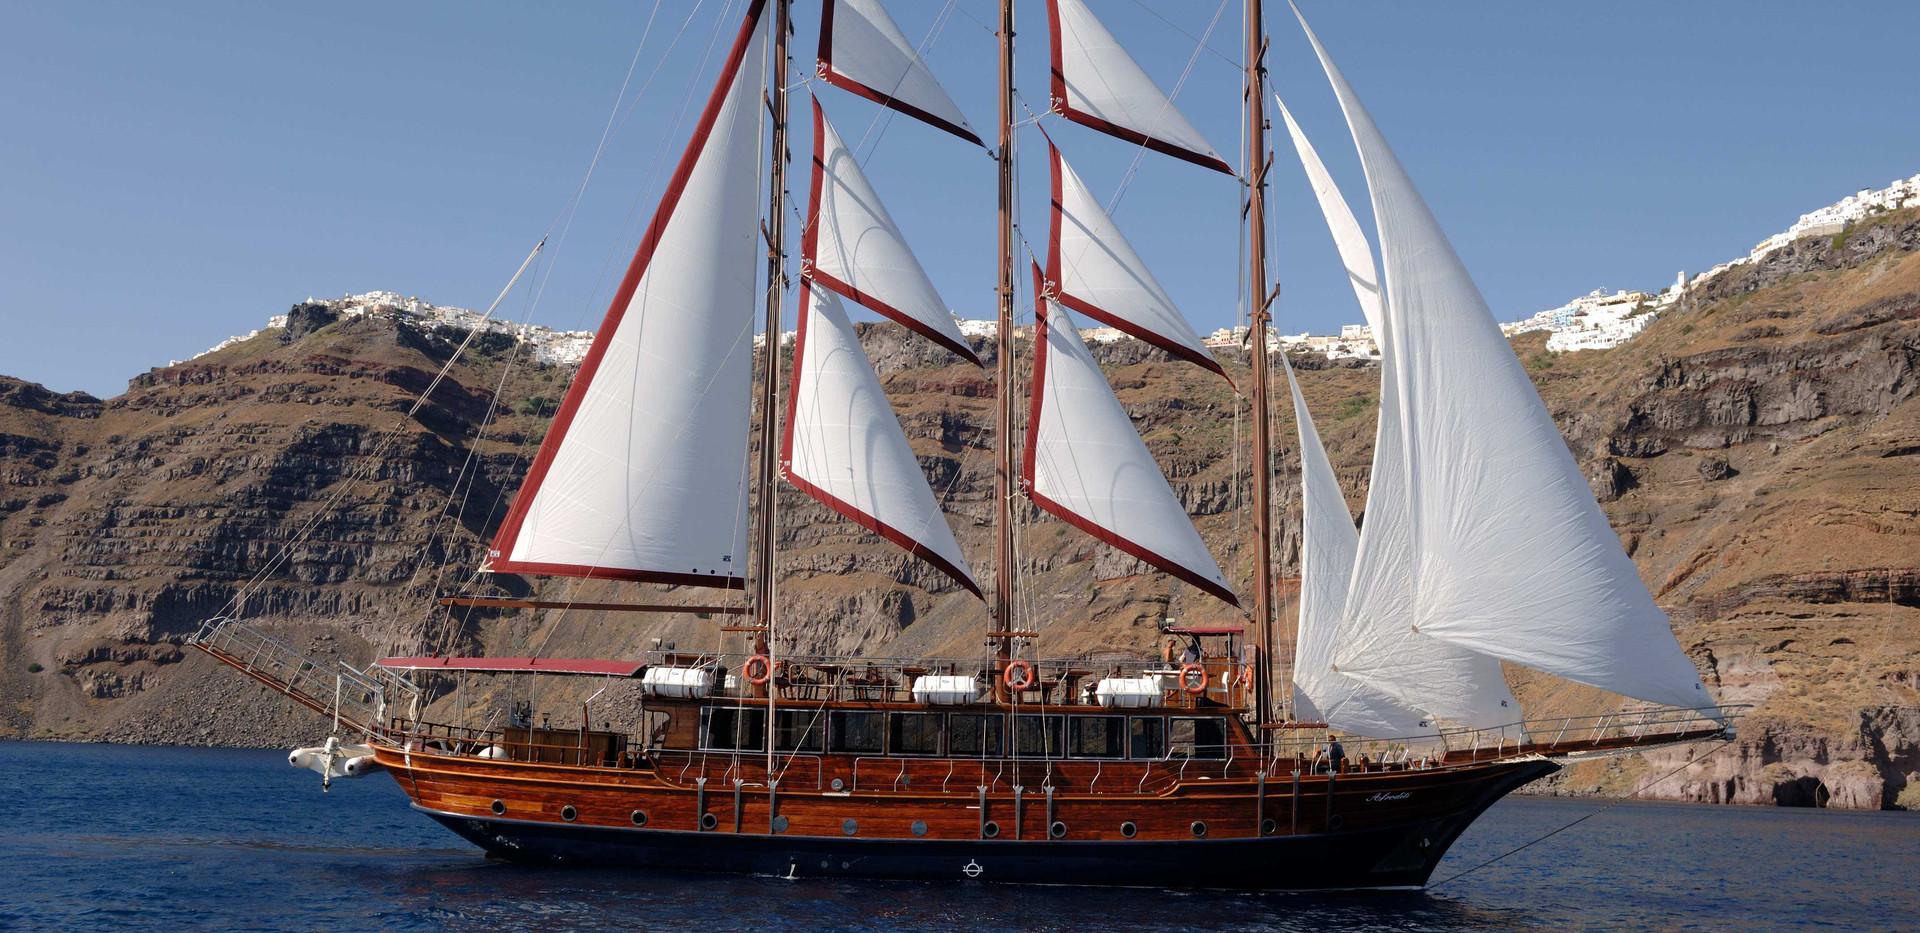 sail from greece 1.jpg